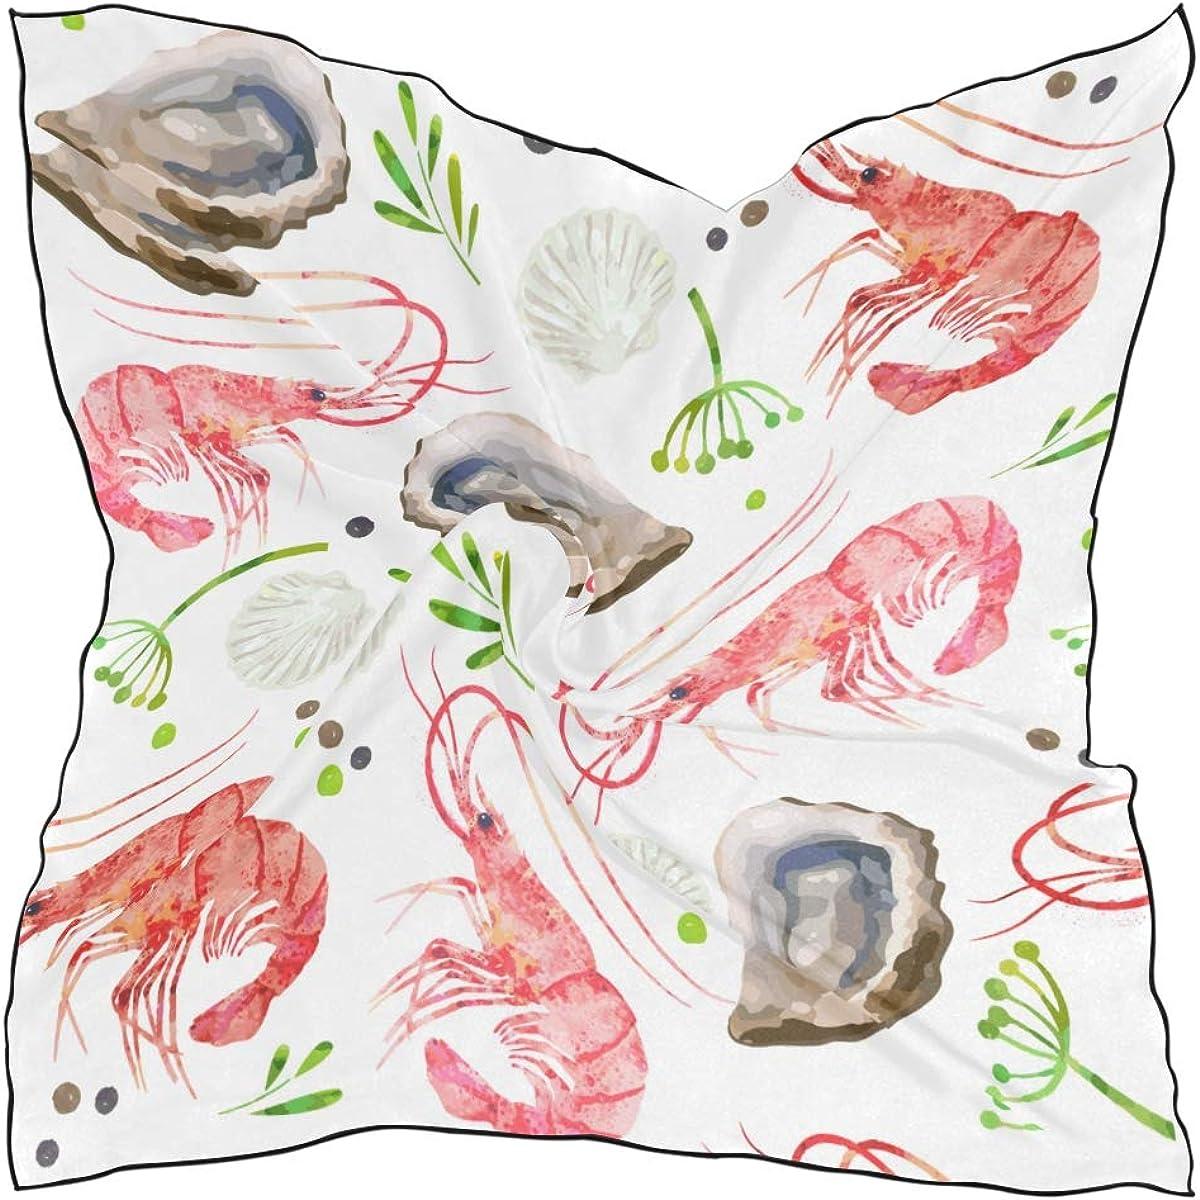 Women's Soft Polyester Silk Square Scarf Shrimp Seafood Food Water Bio Animation Design Fashion Print Head & Hair Scarf Neckerchief Accessory-23.6x23.6 Inch